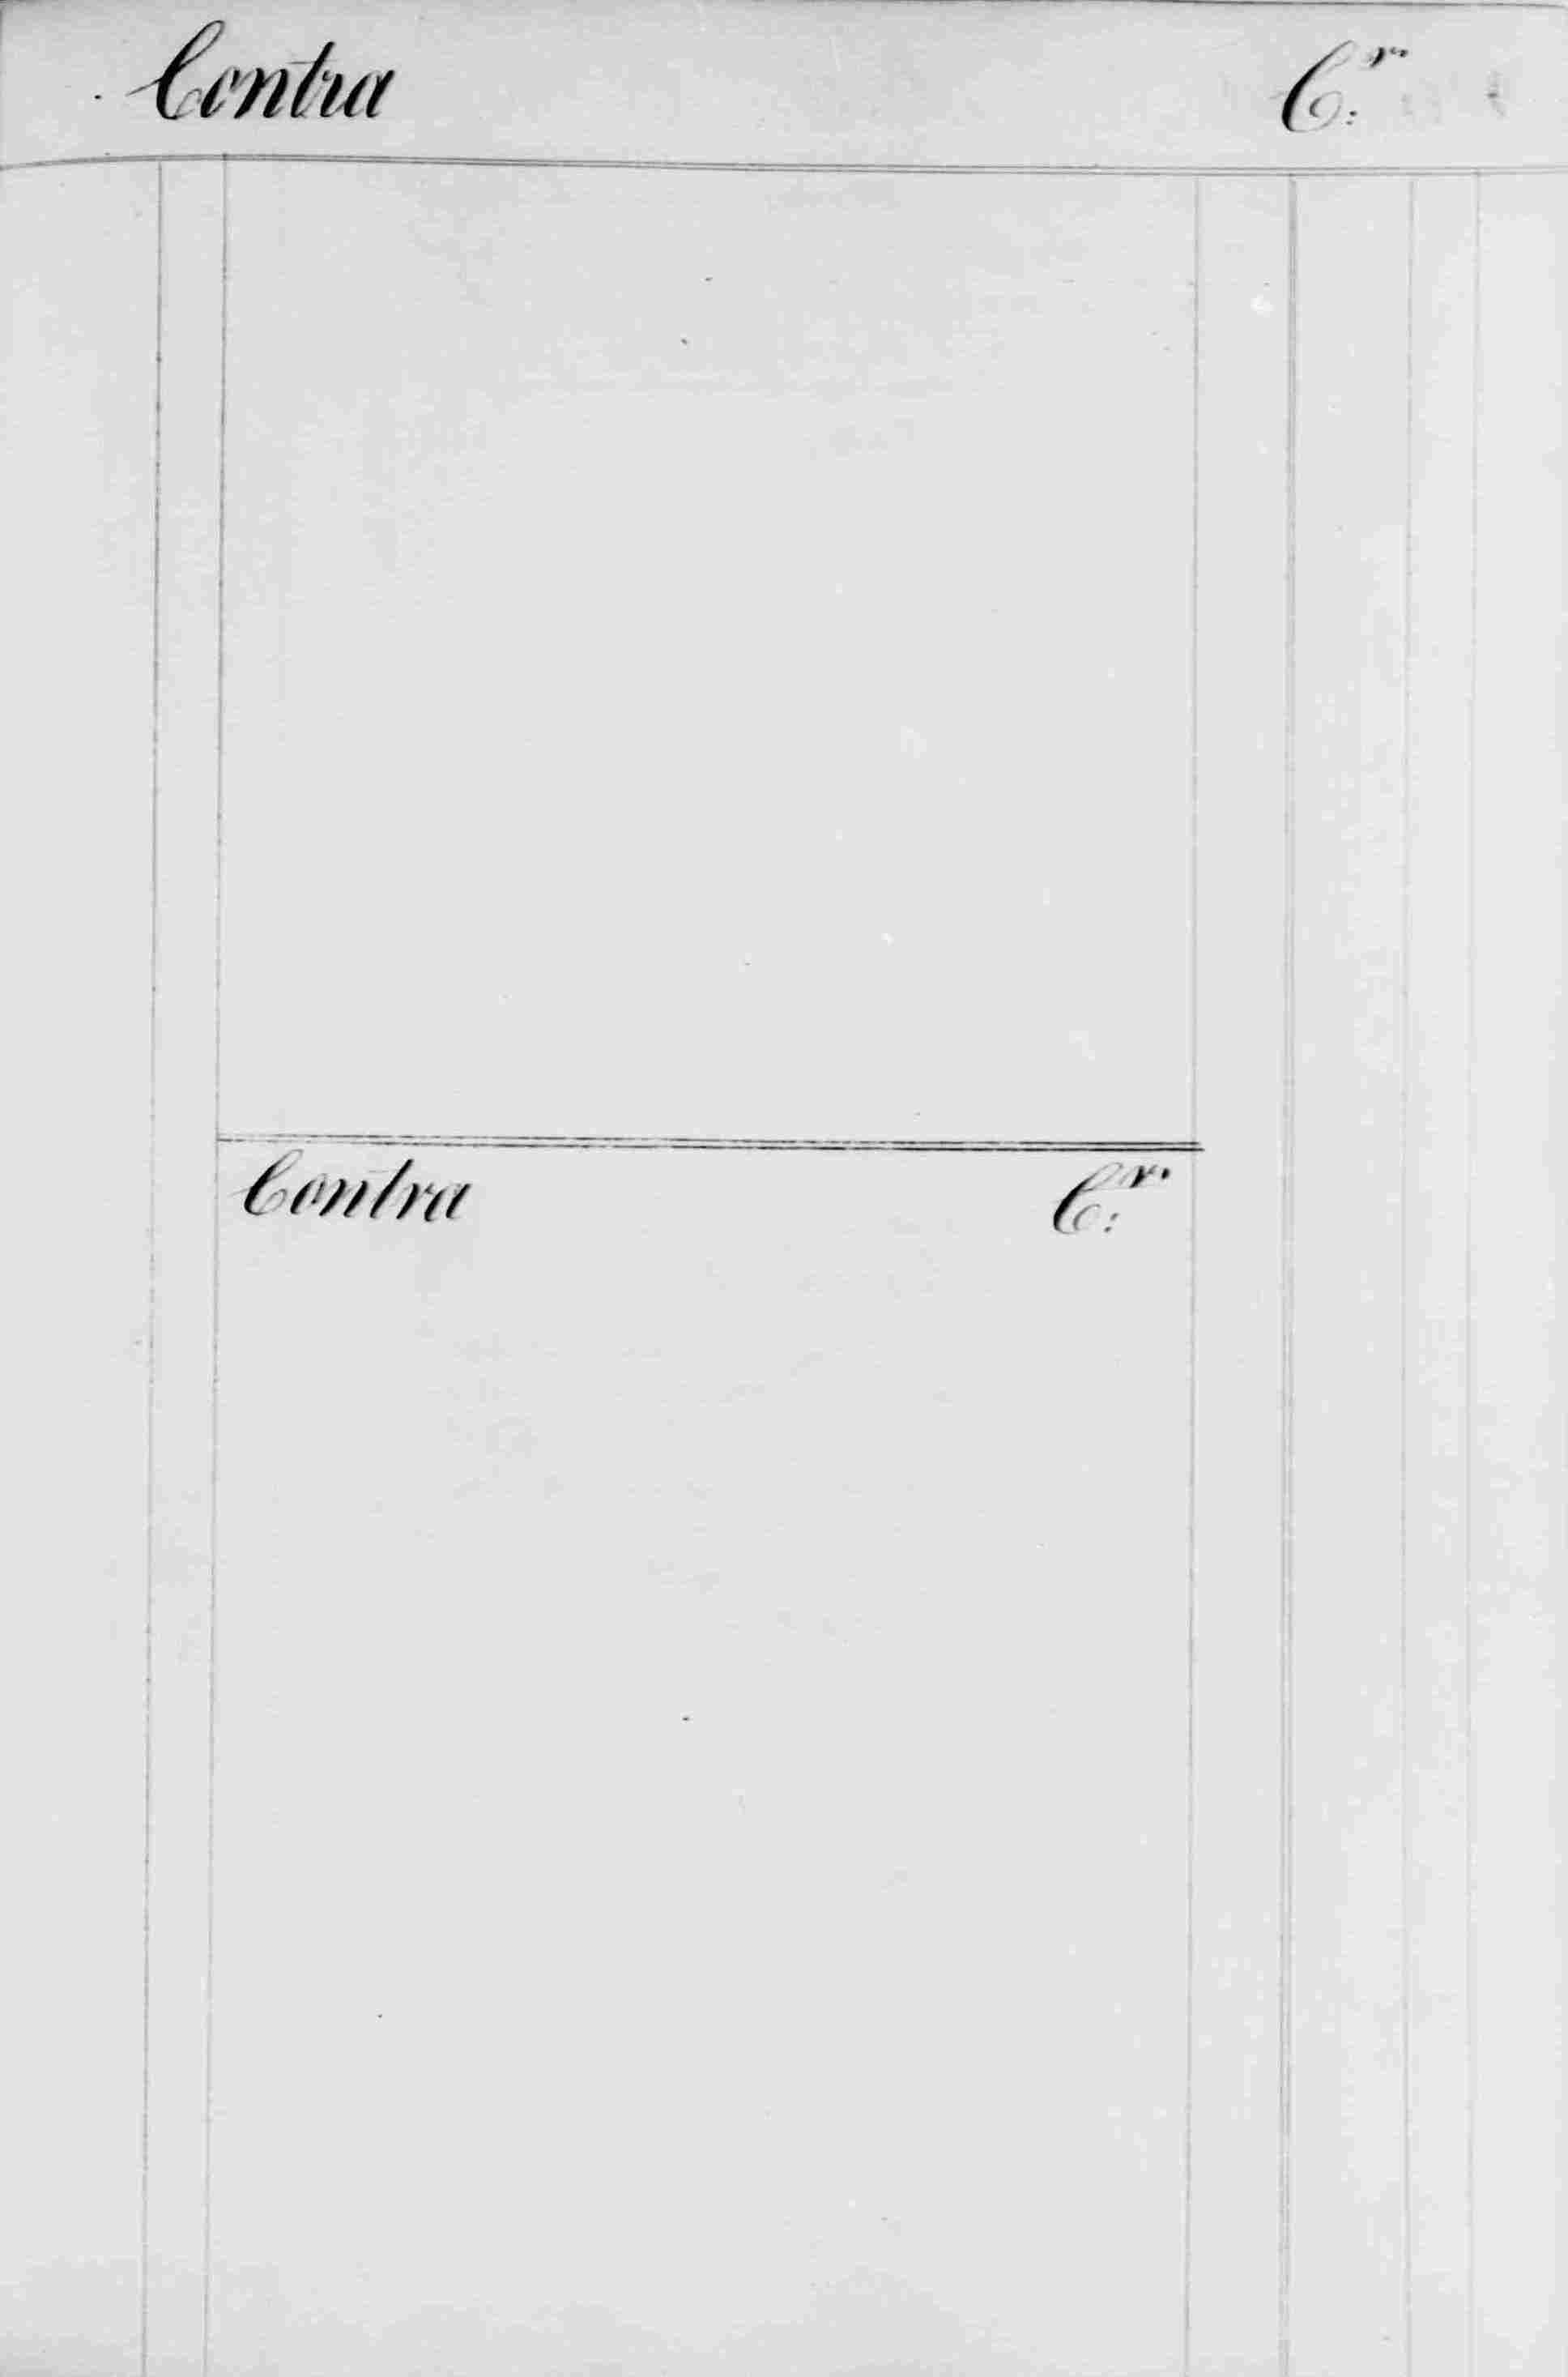 Ledger B, folio 285, right side